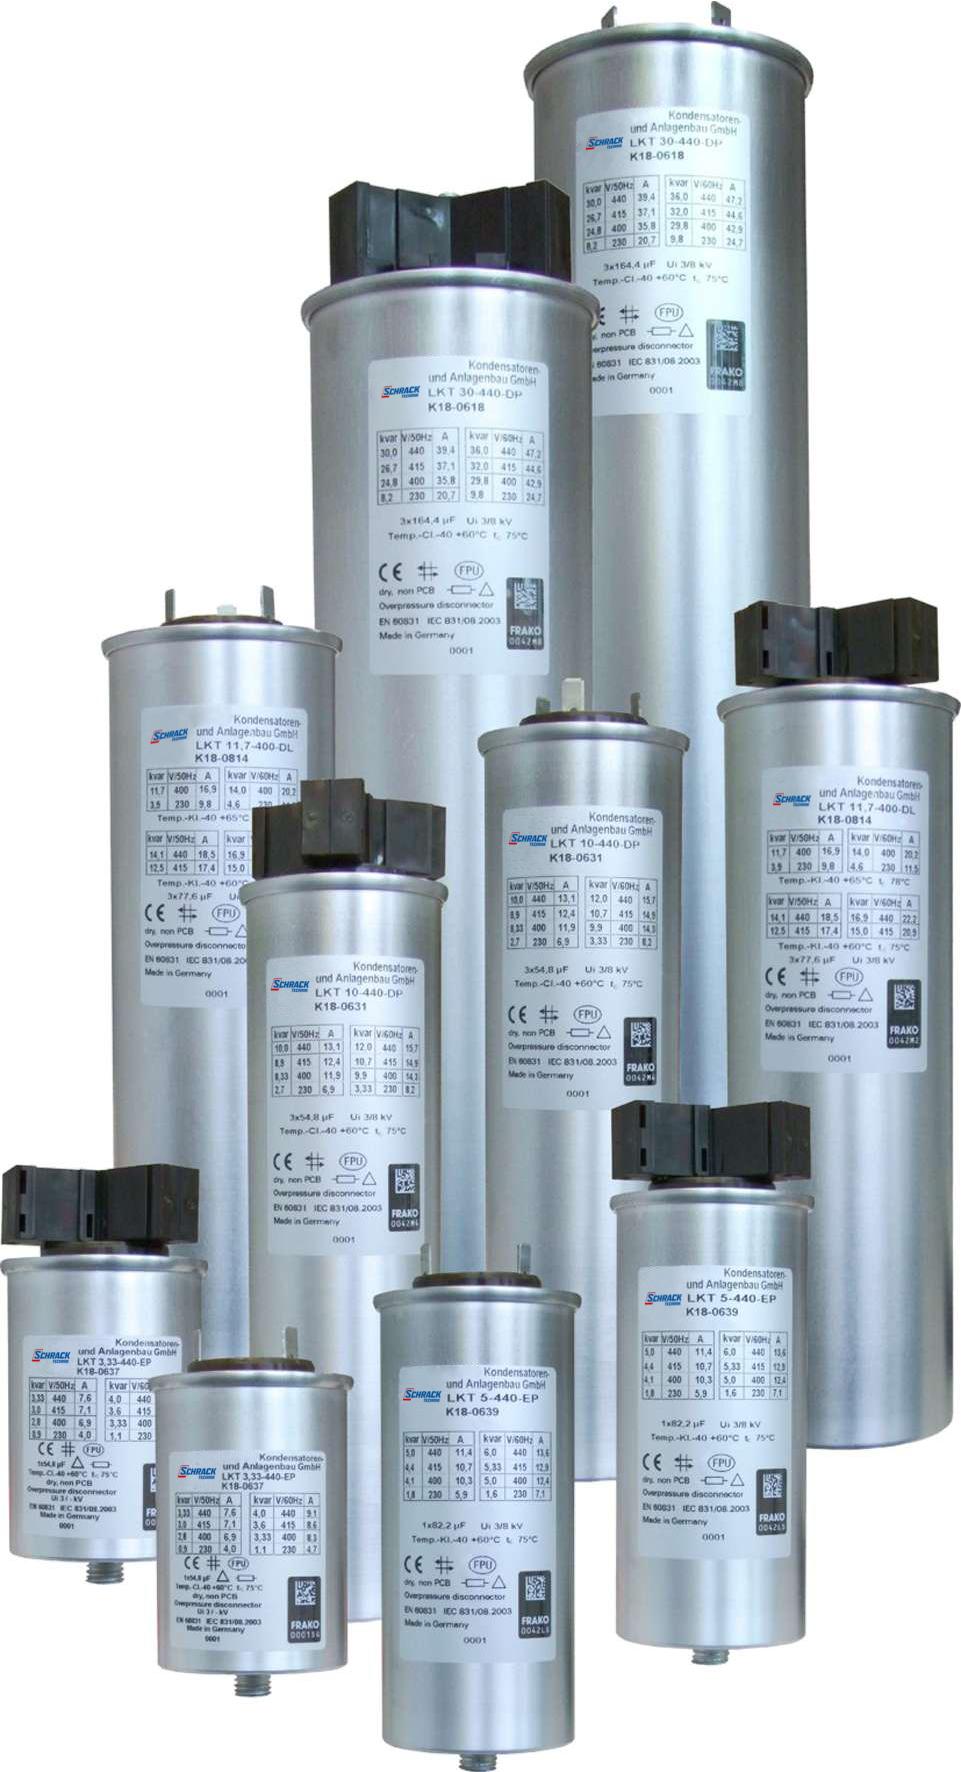 1 Stk Leistungskondensator 440V Qc=5,2kvar(400V) Qc=6,25kvar(440V) FRLK06344B